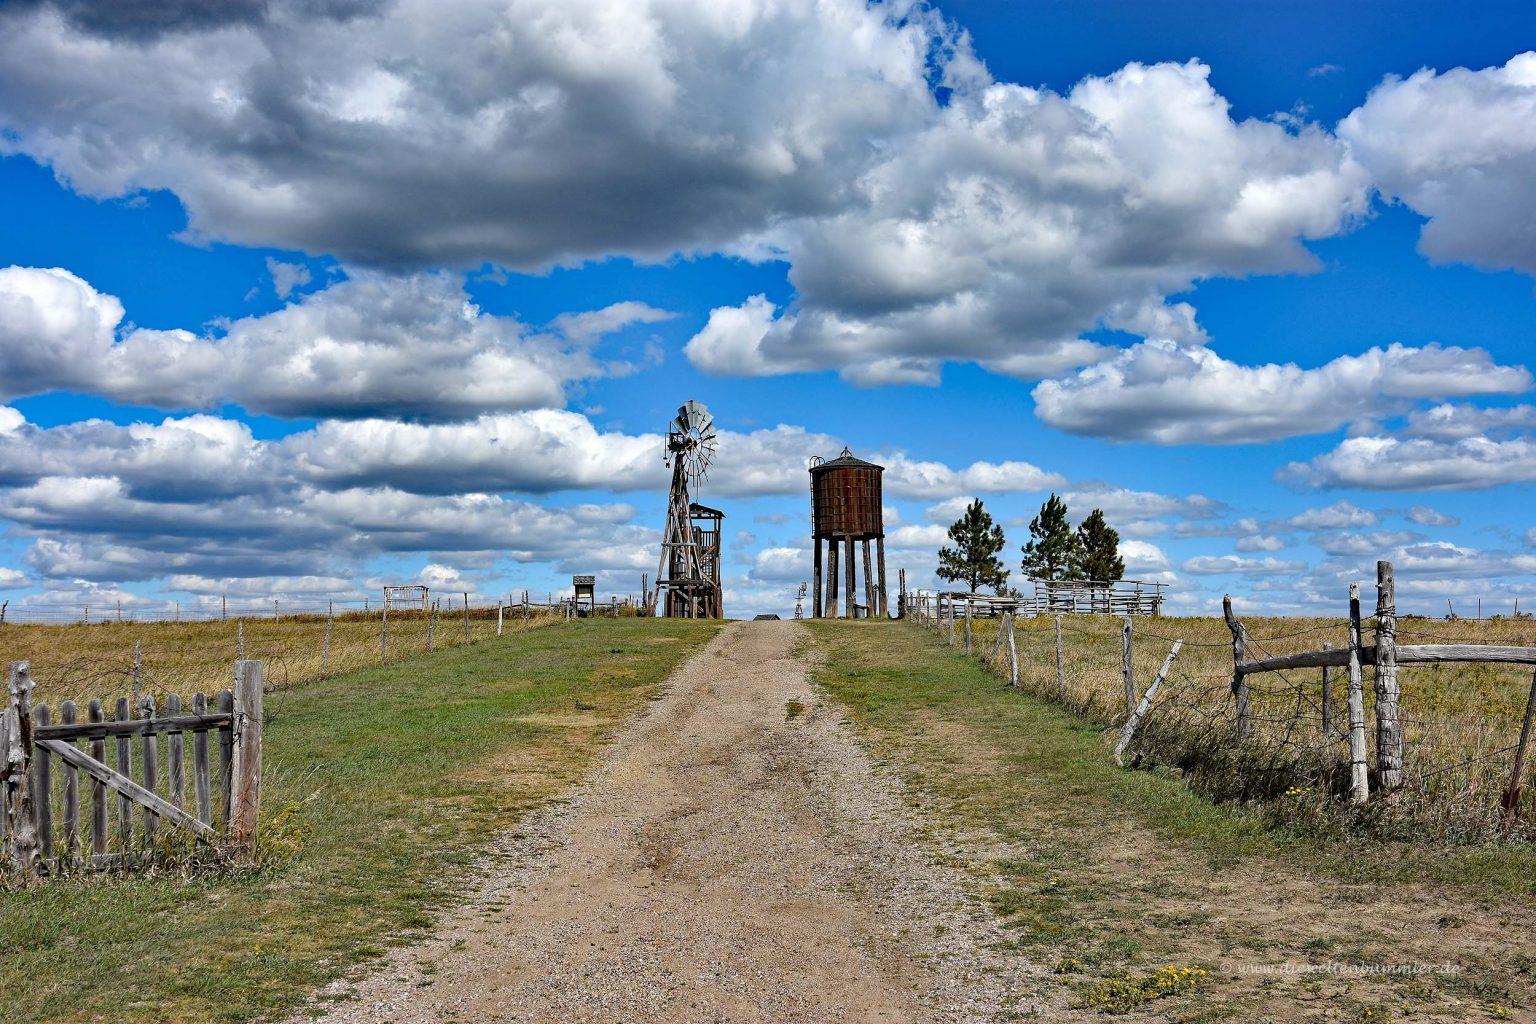 Windrad und Wasserturm